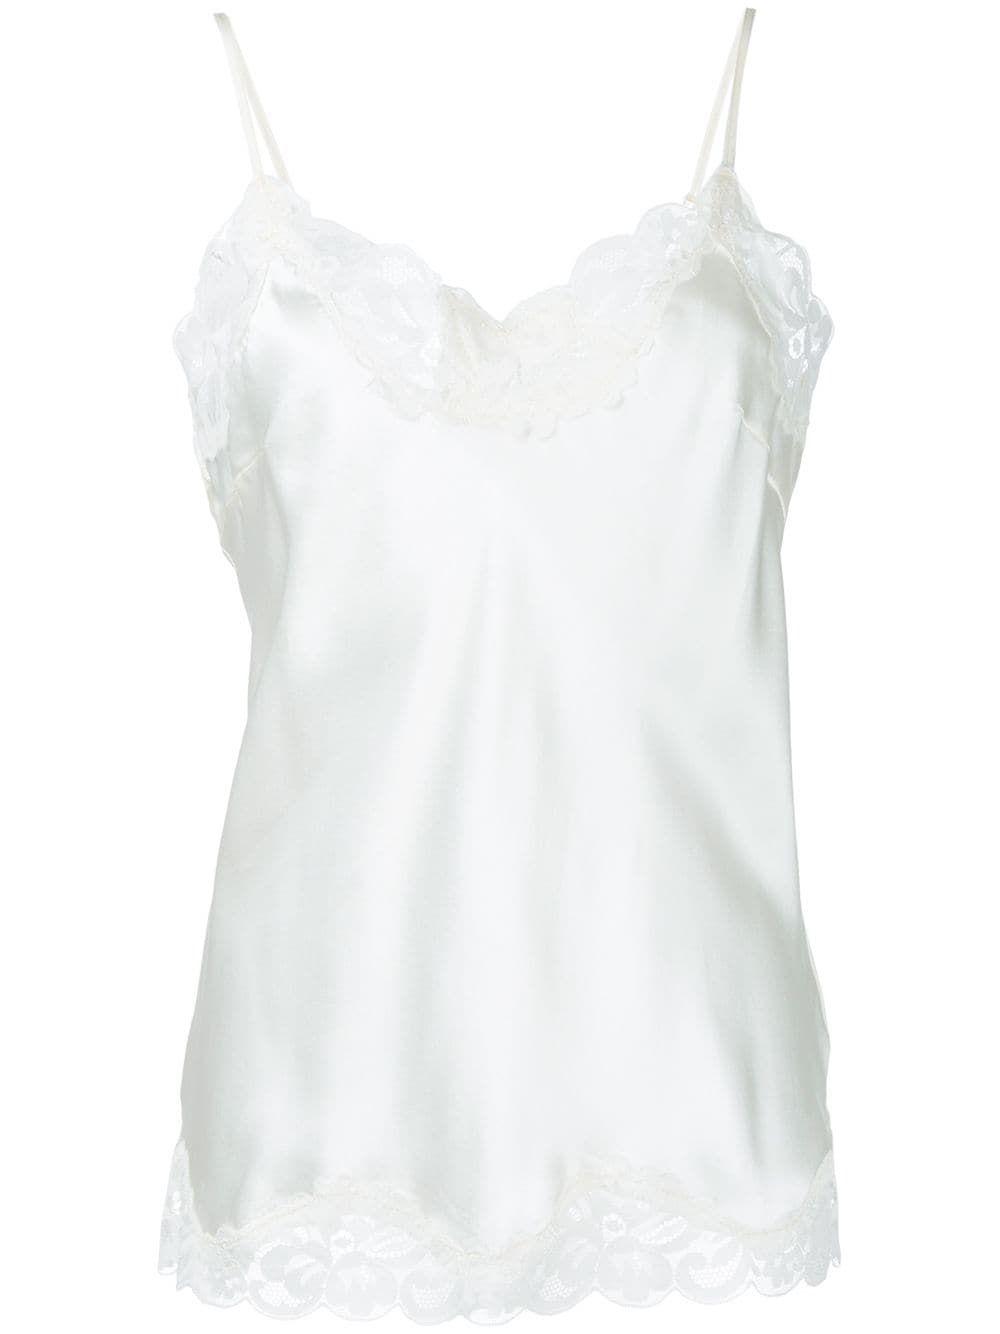 Women/'s Camisole Pajama Top Betsey Johnson White or Orange Adjustable Straps NEW